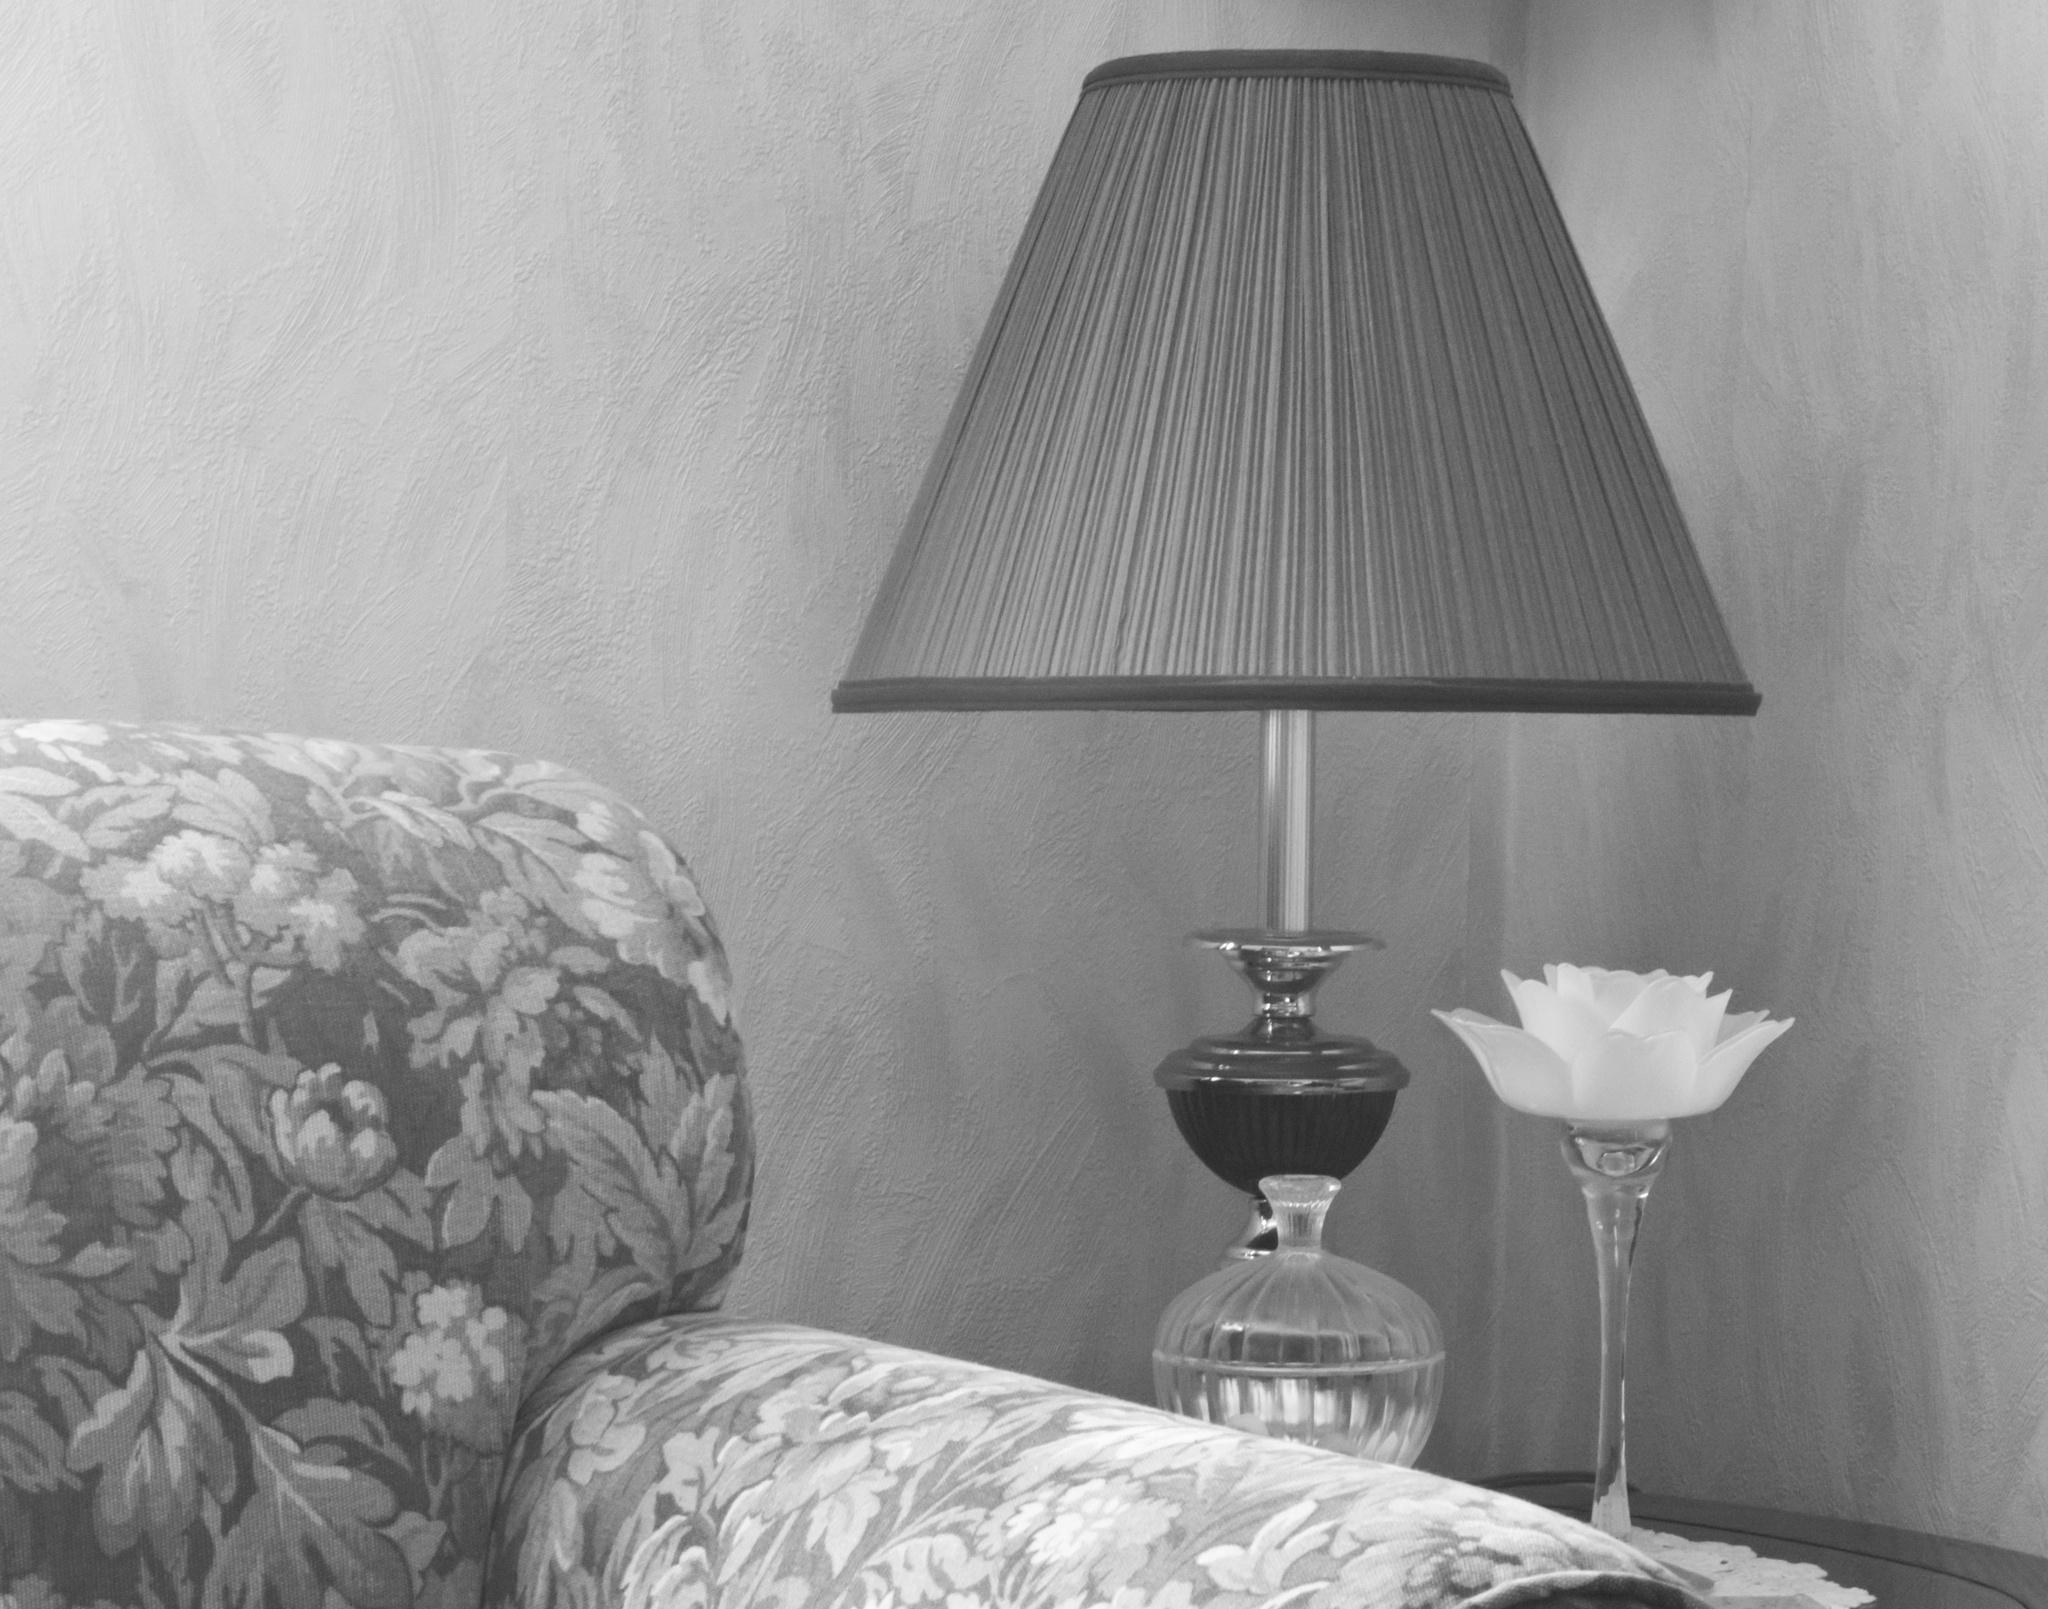 The Living Room Scene by JamesJewers